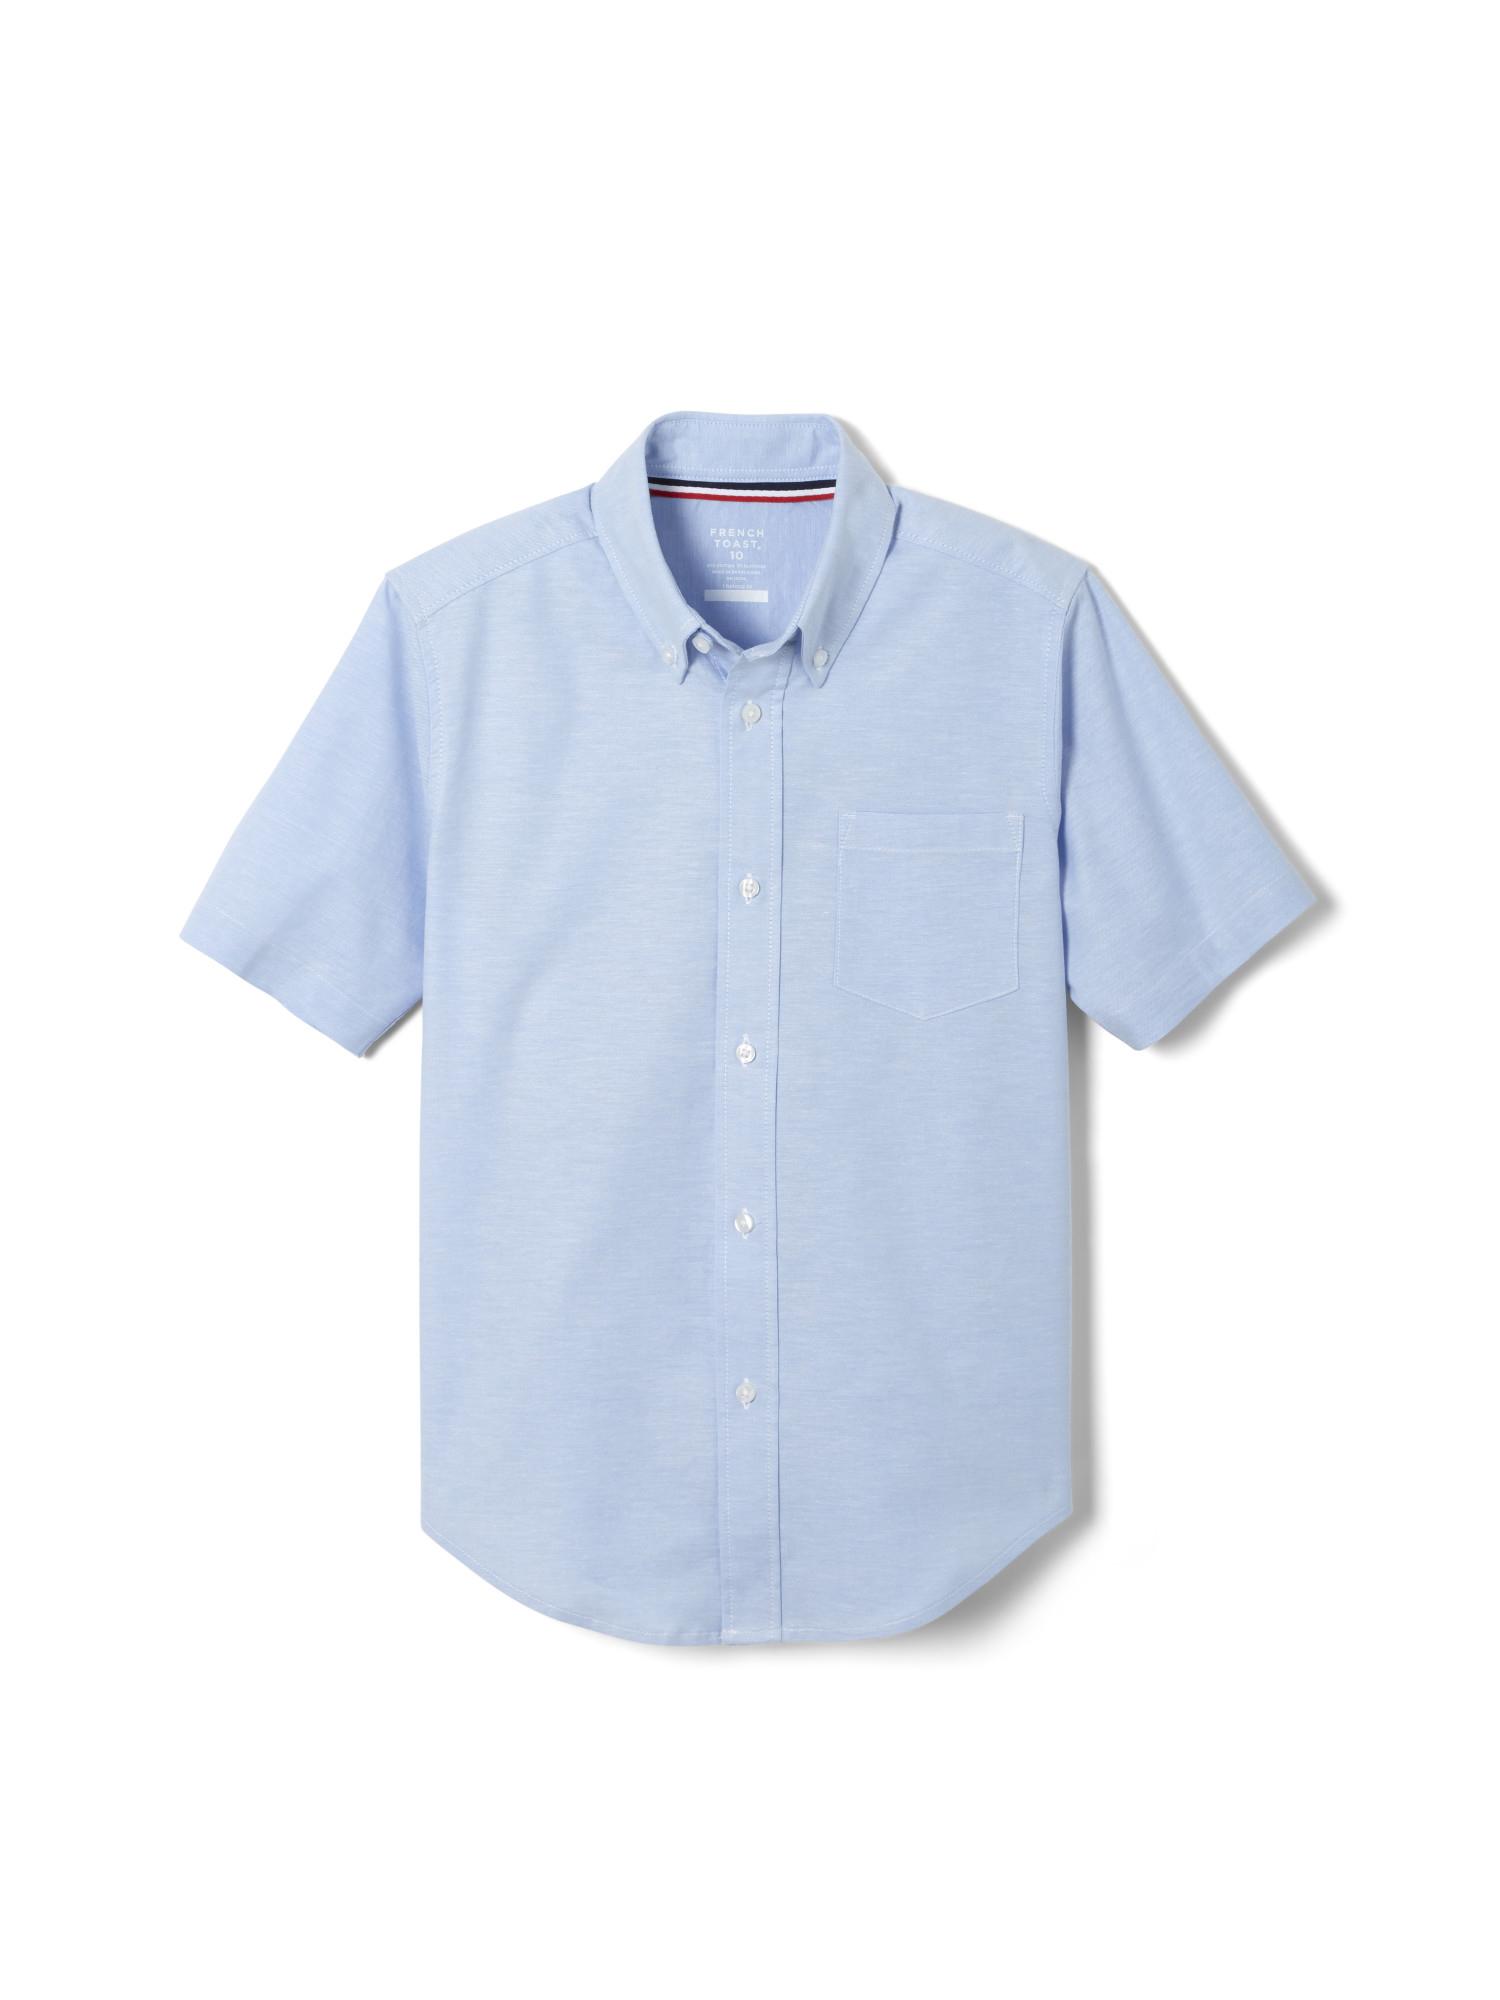 Standard /& Husky French Toast Boys Short Sleeve Classic Poplin Dress Shirt